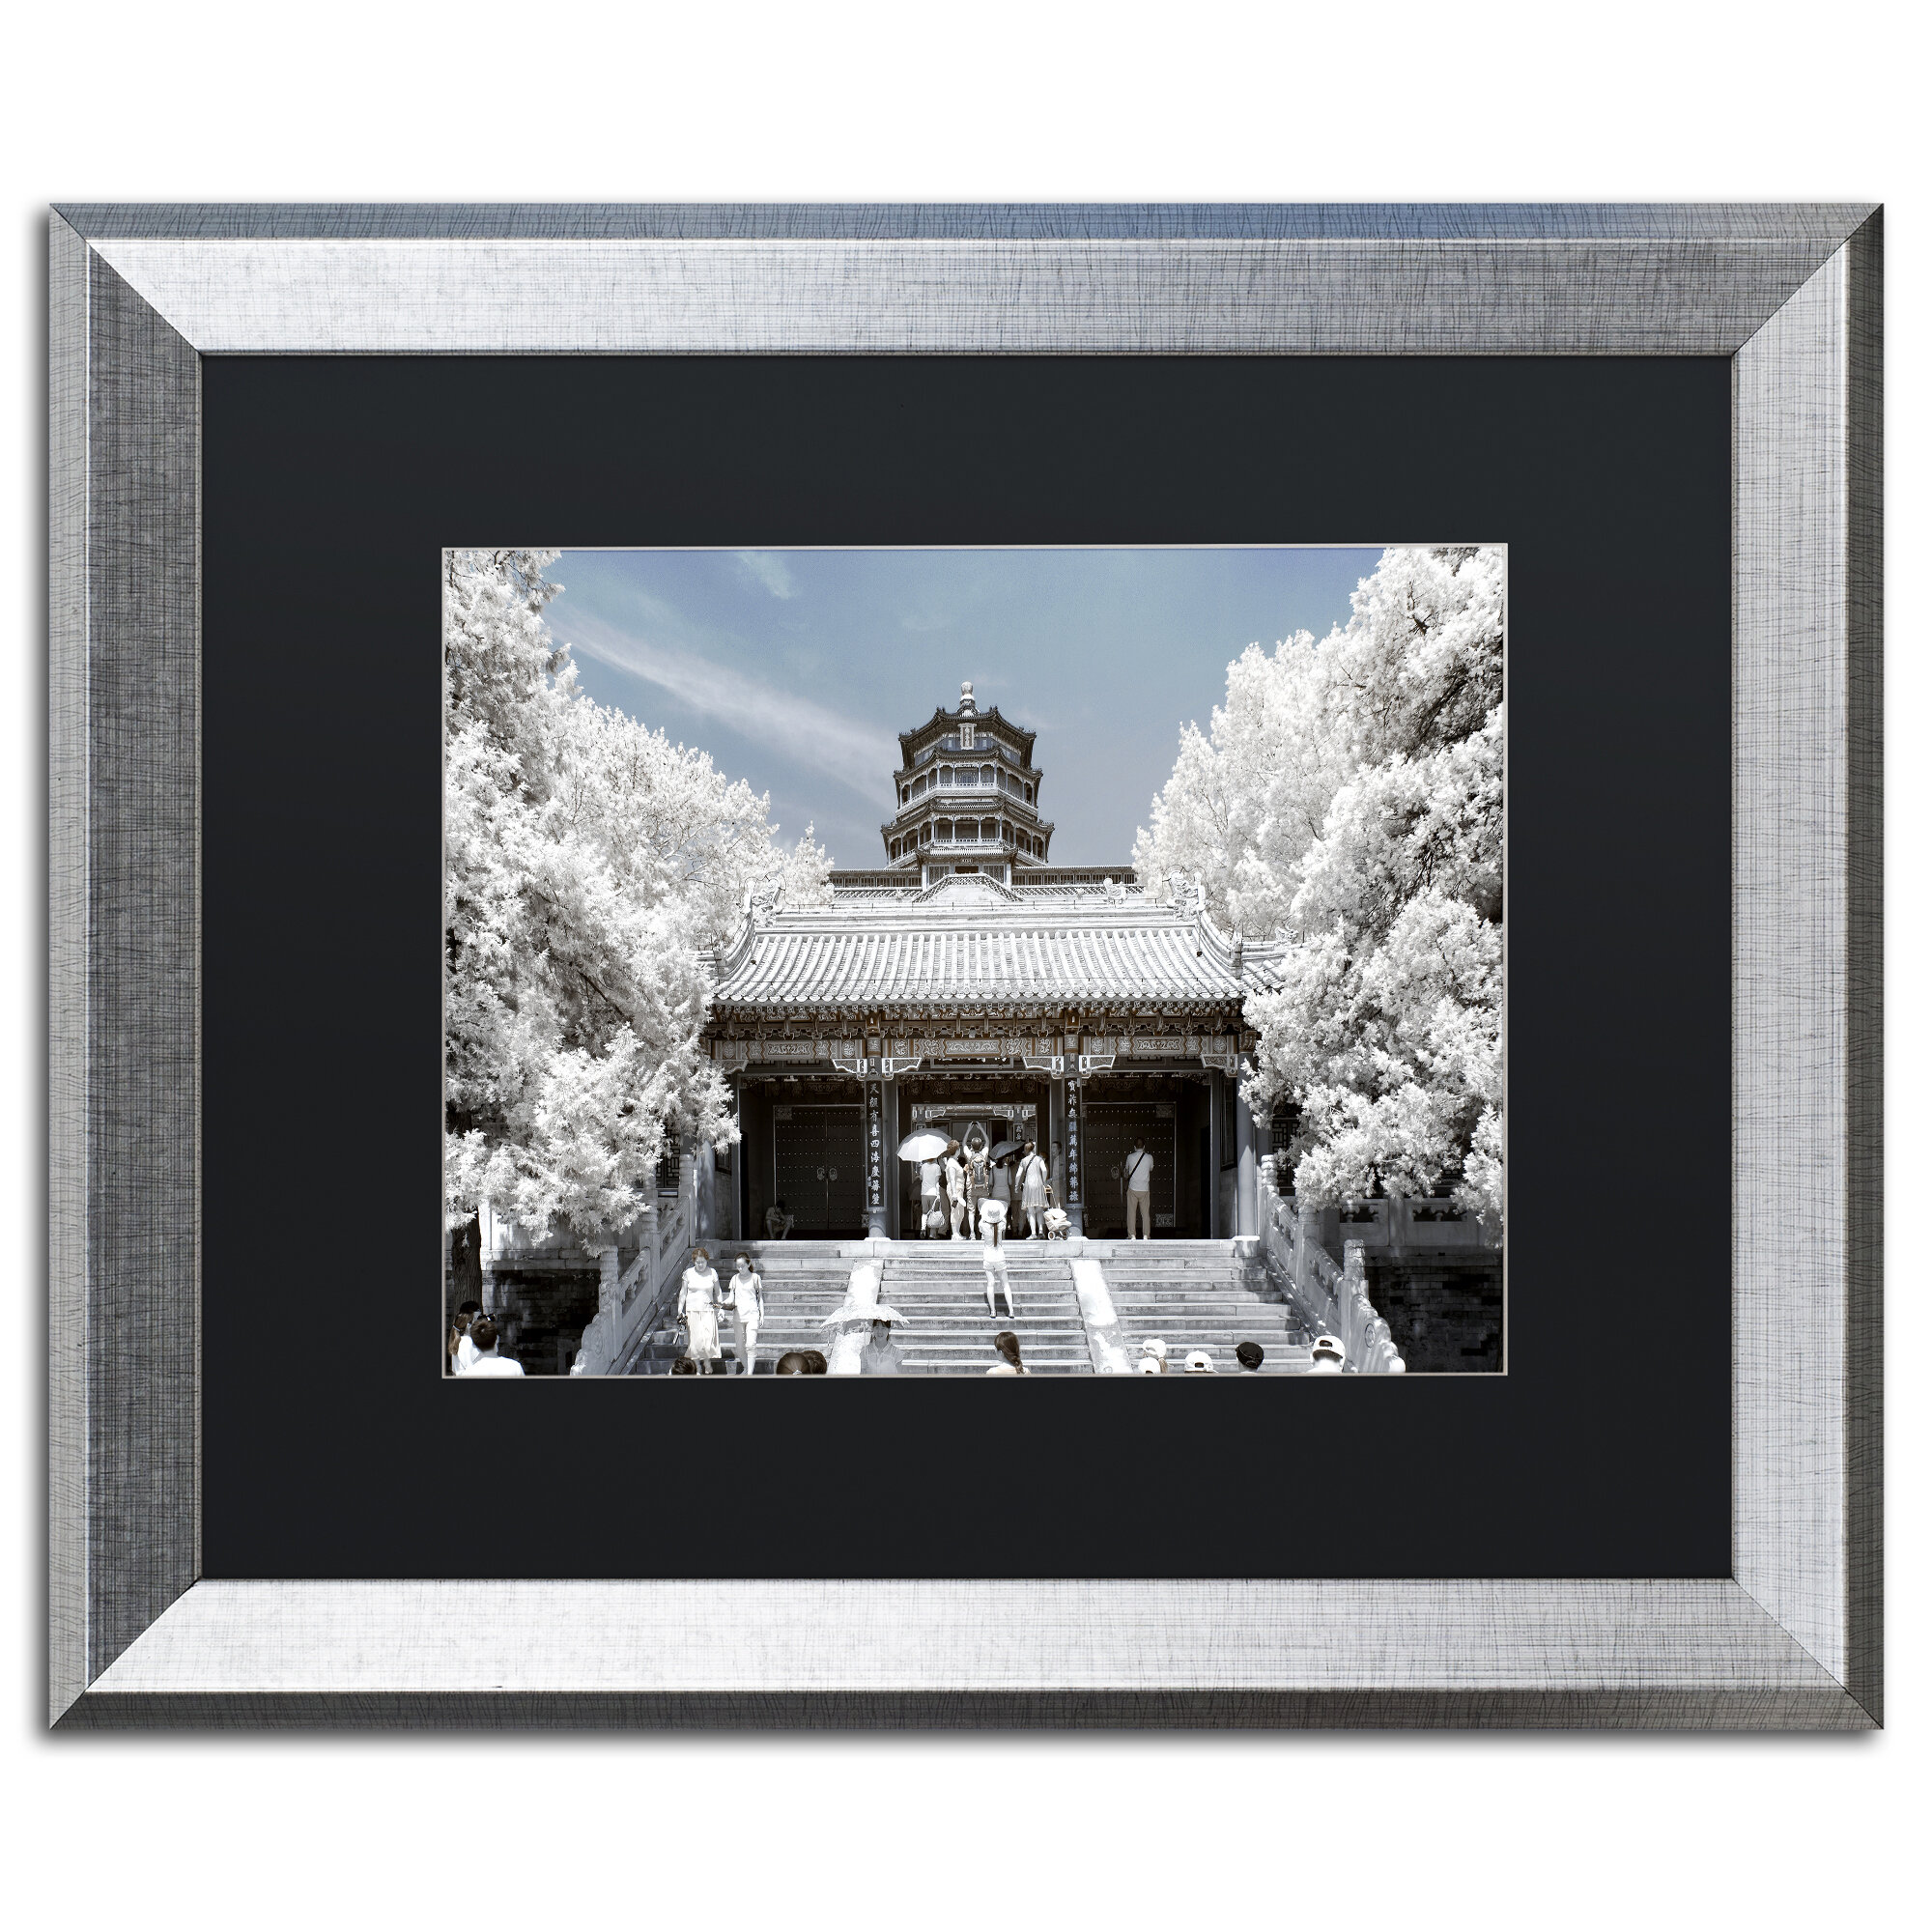 Trademark Art White Palace I By Philippe Hugonnard Framed Photographic Print Wayfair